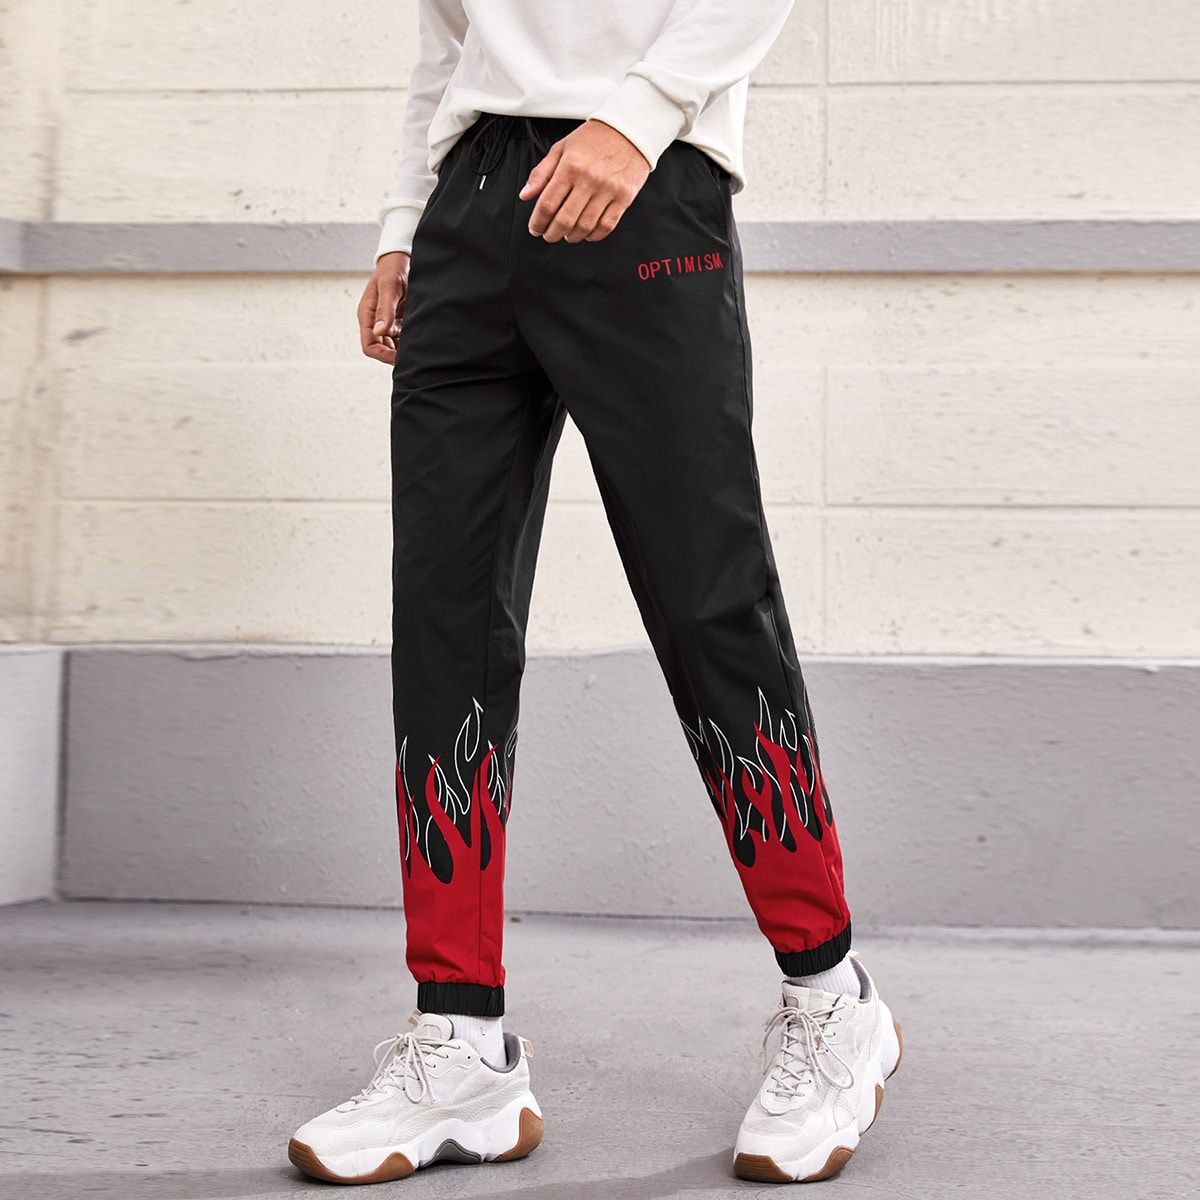 Карман буква спортивный мужские брюки